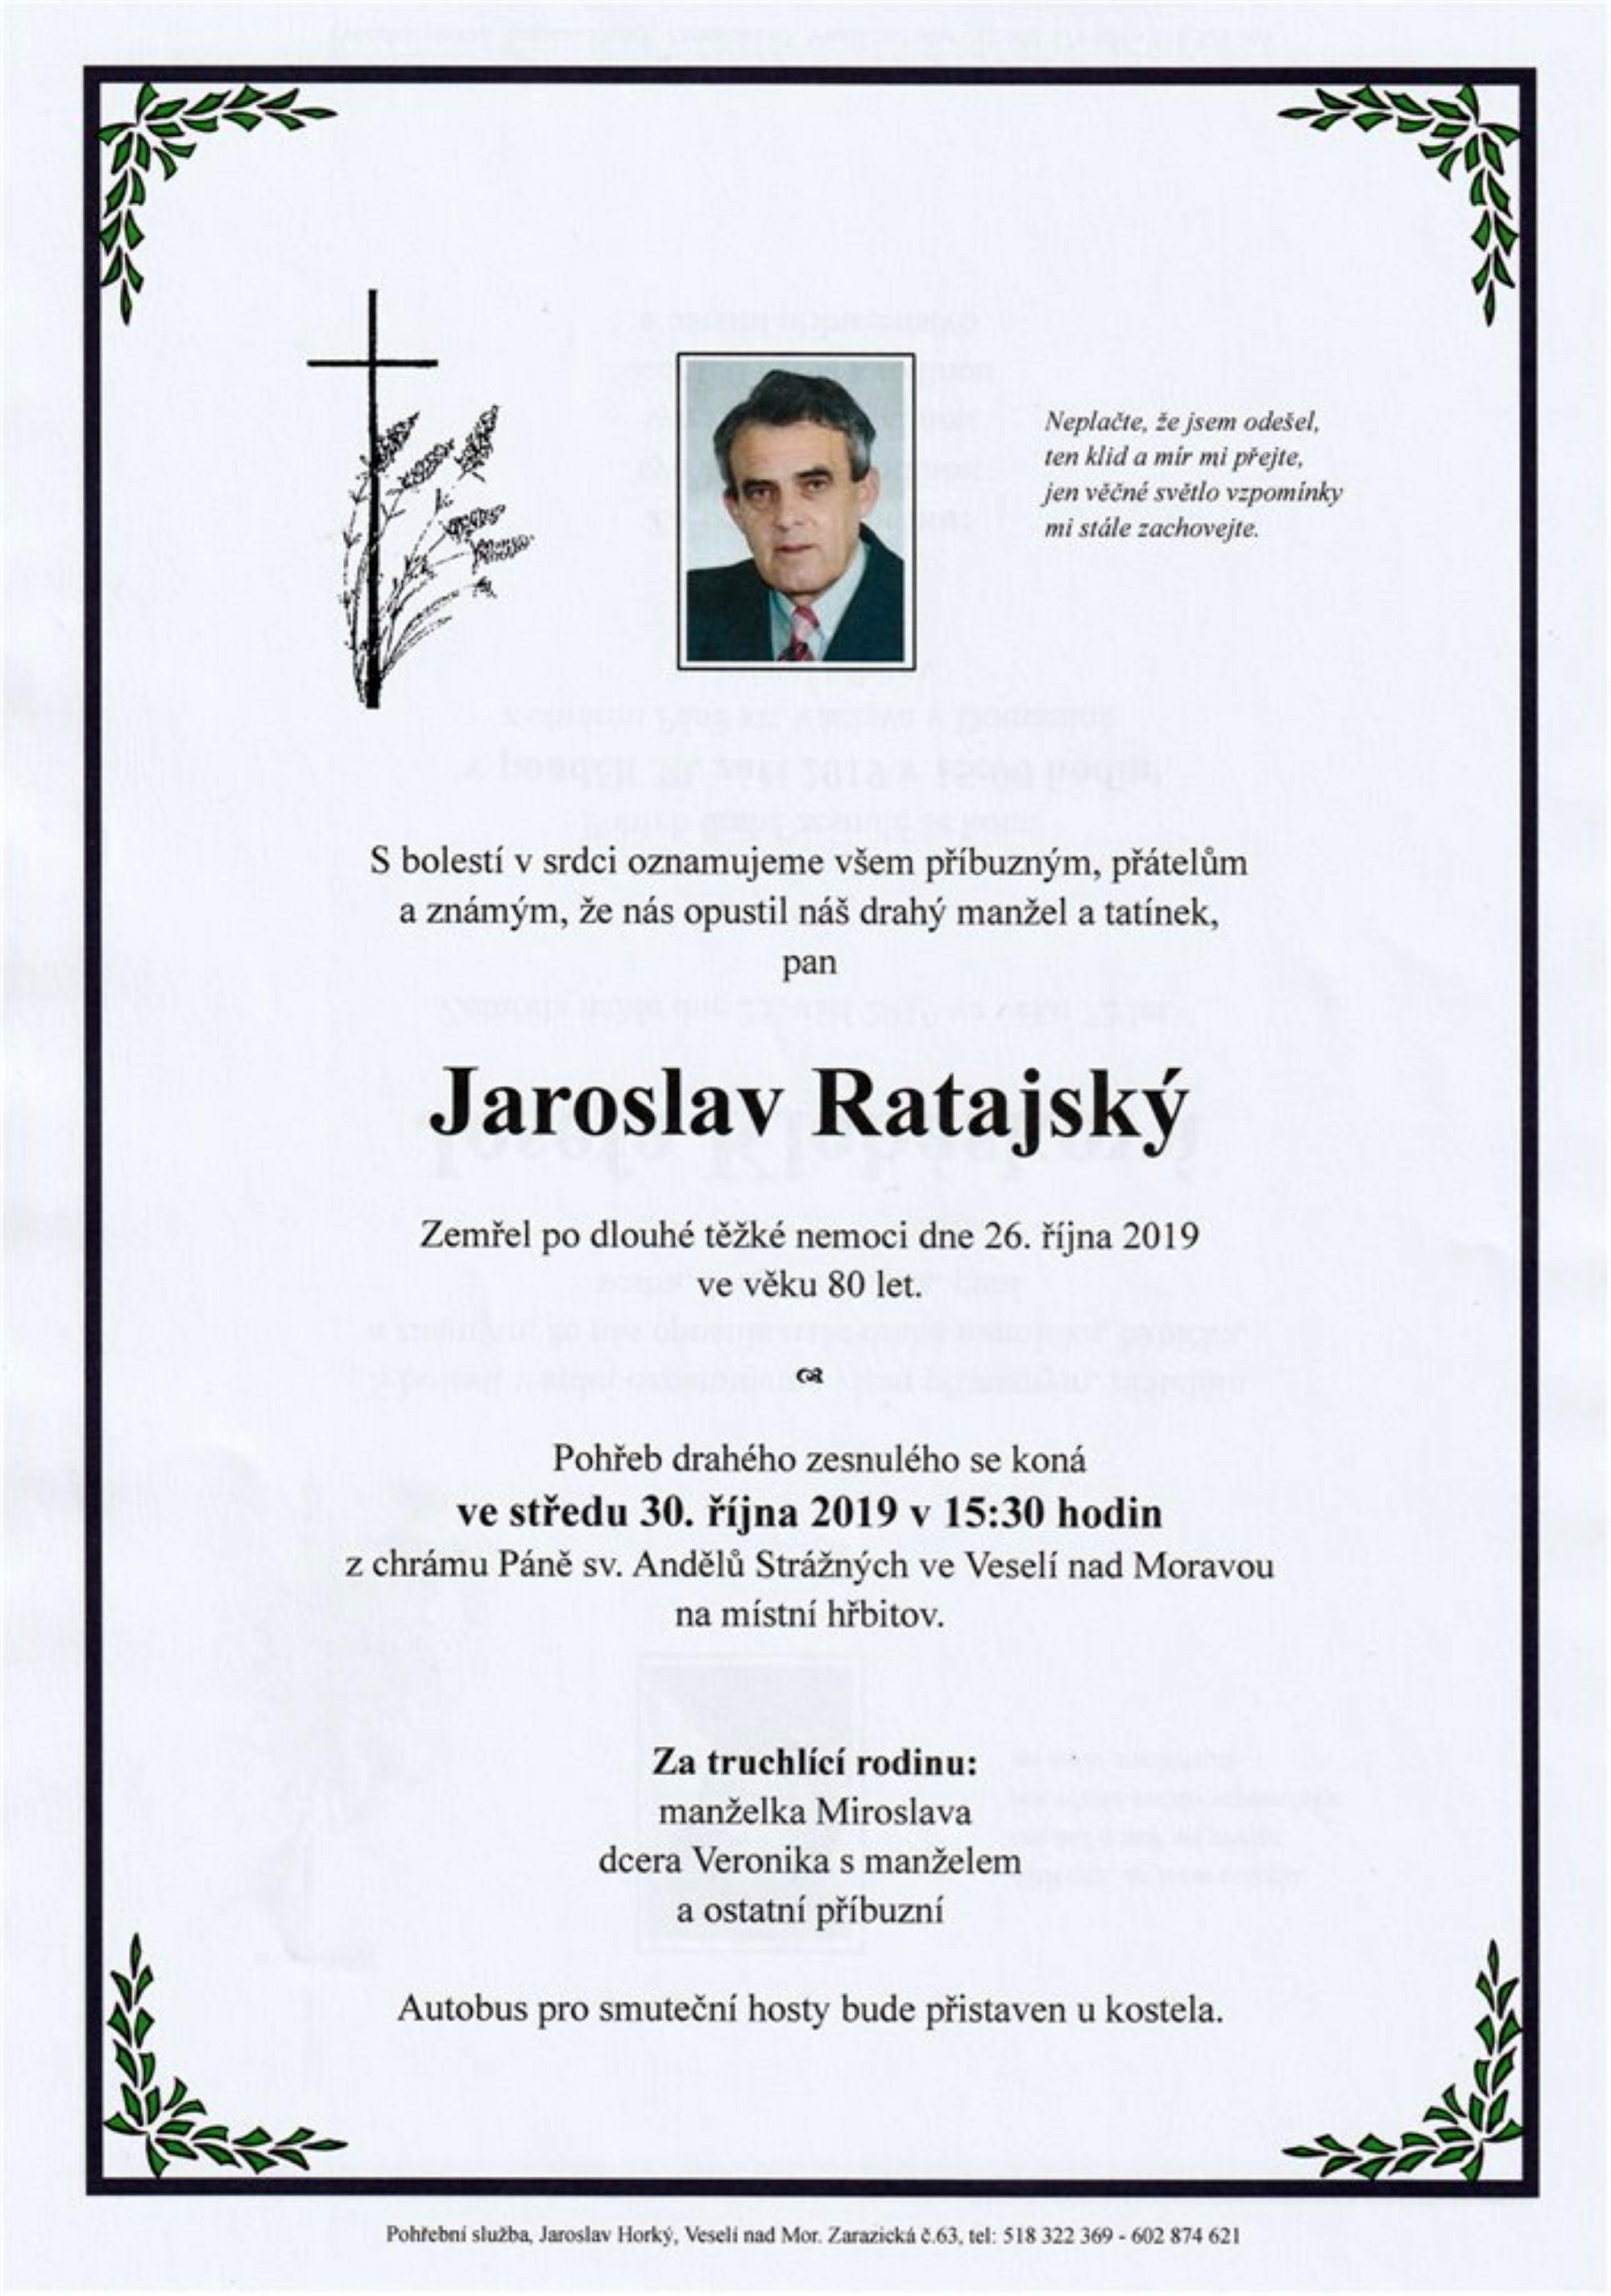 Jaroslav Ratajský